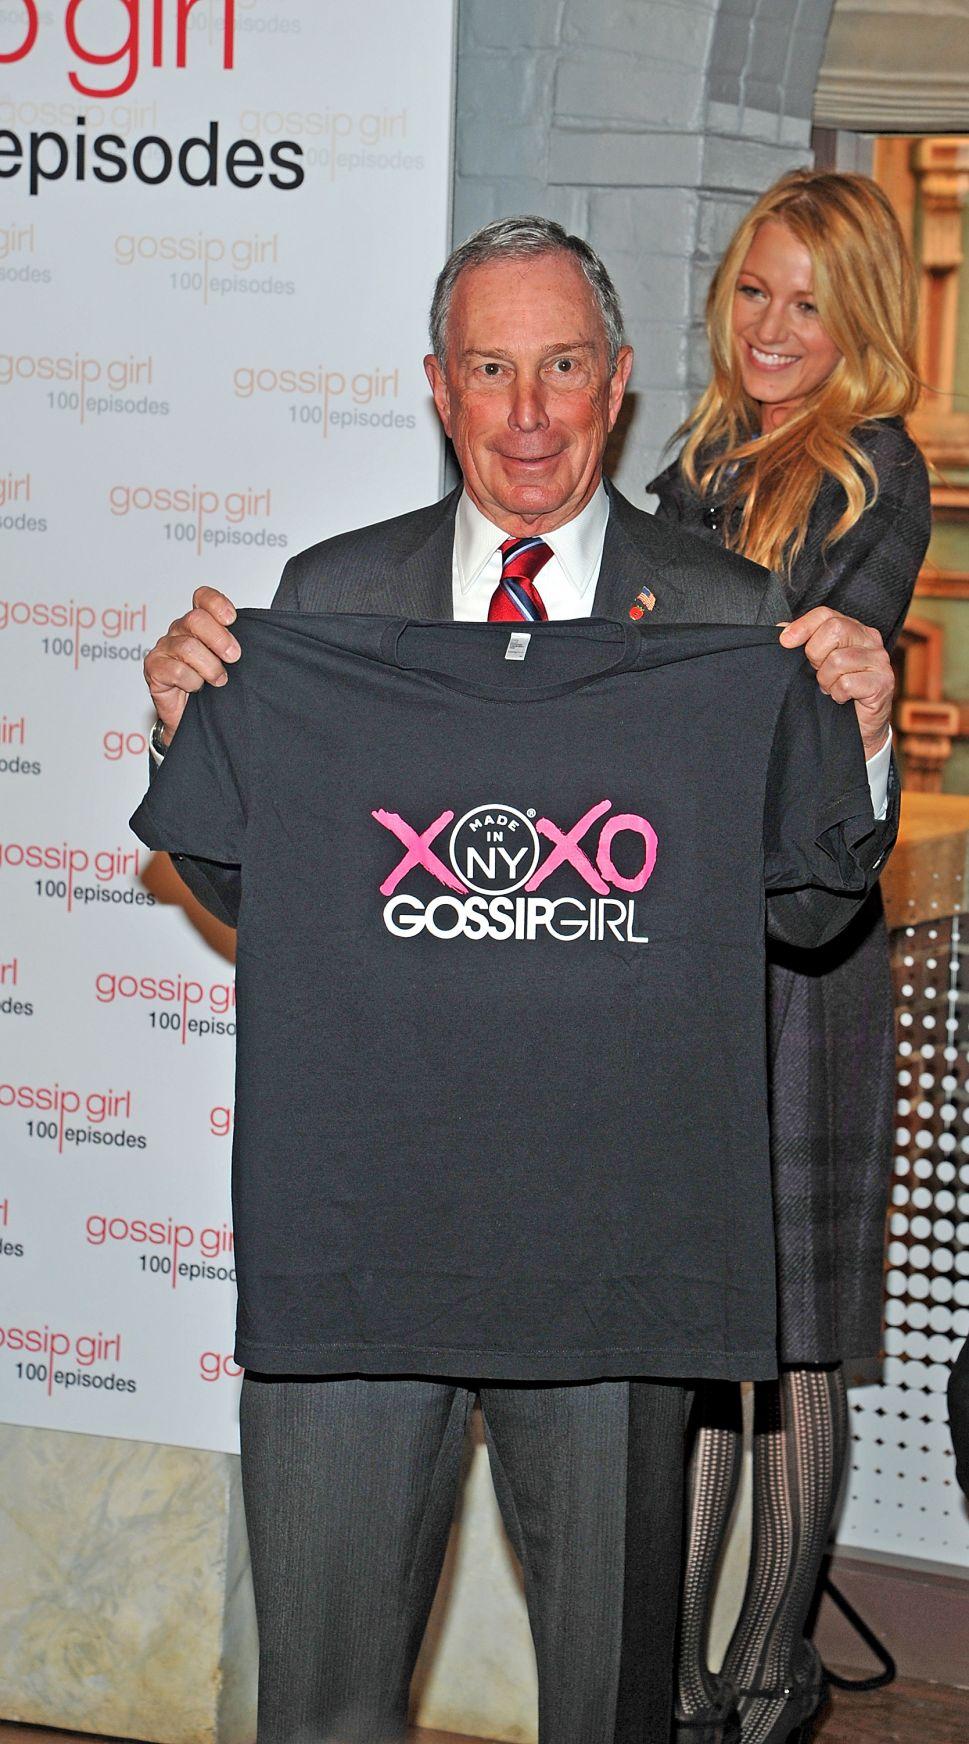 5 Reasons Mayor Bloomberg is a Teenage Girl